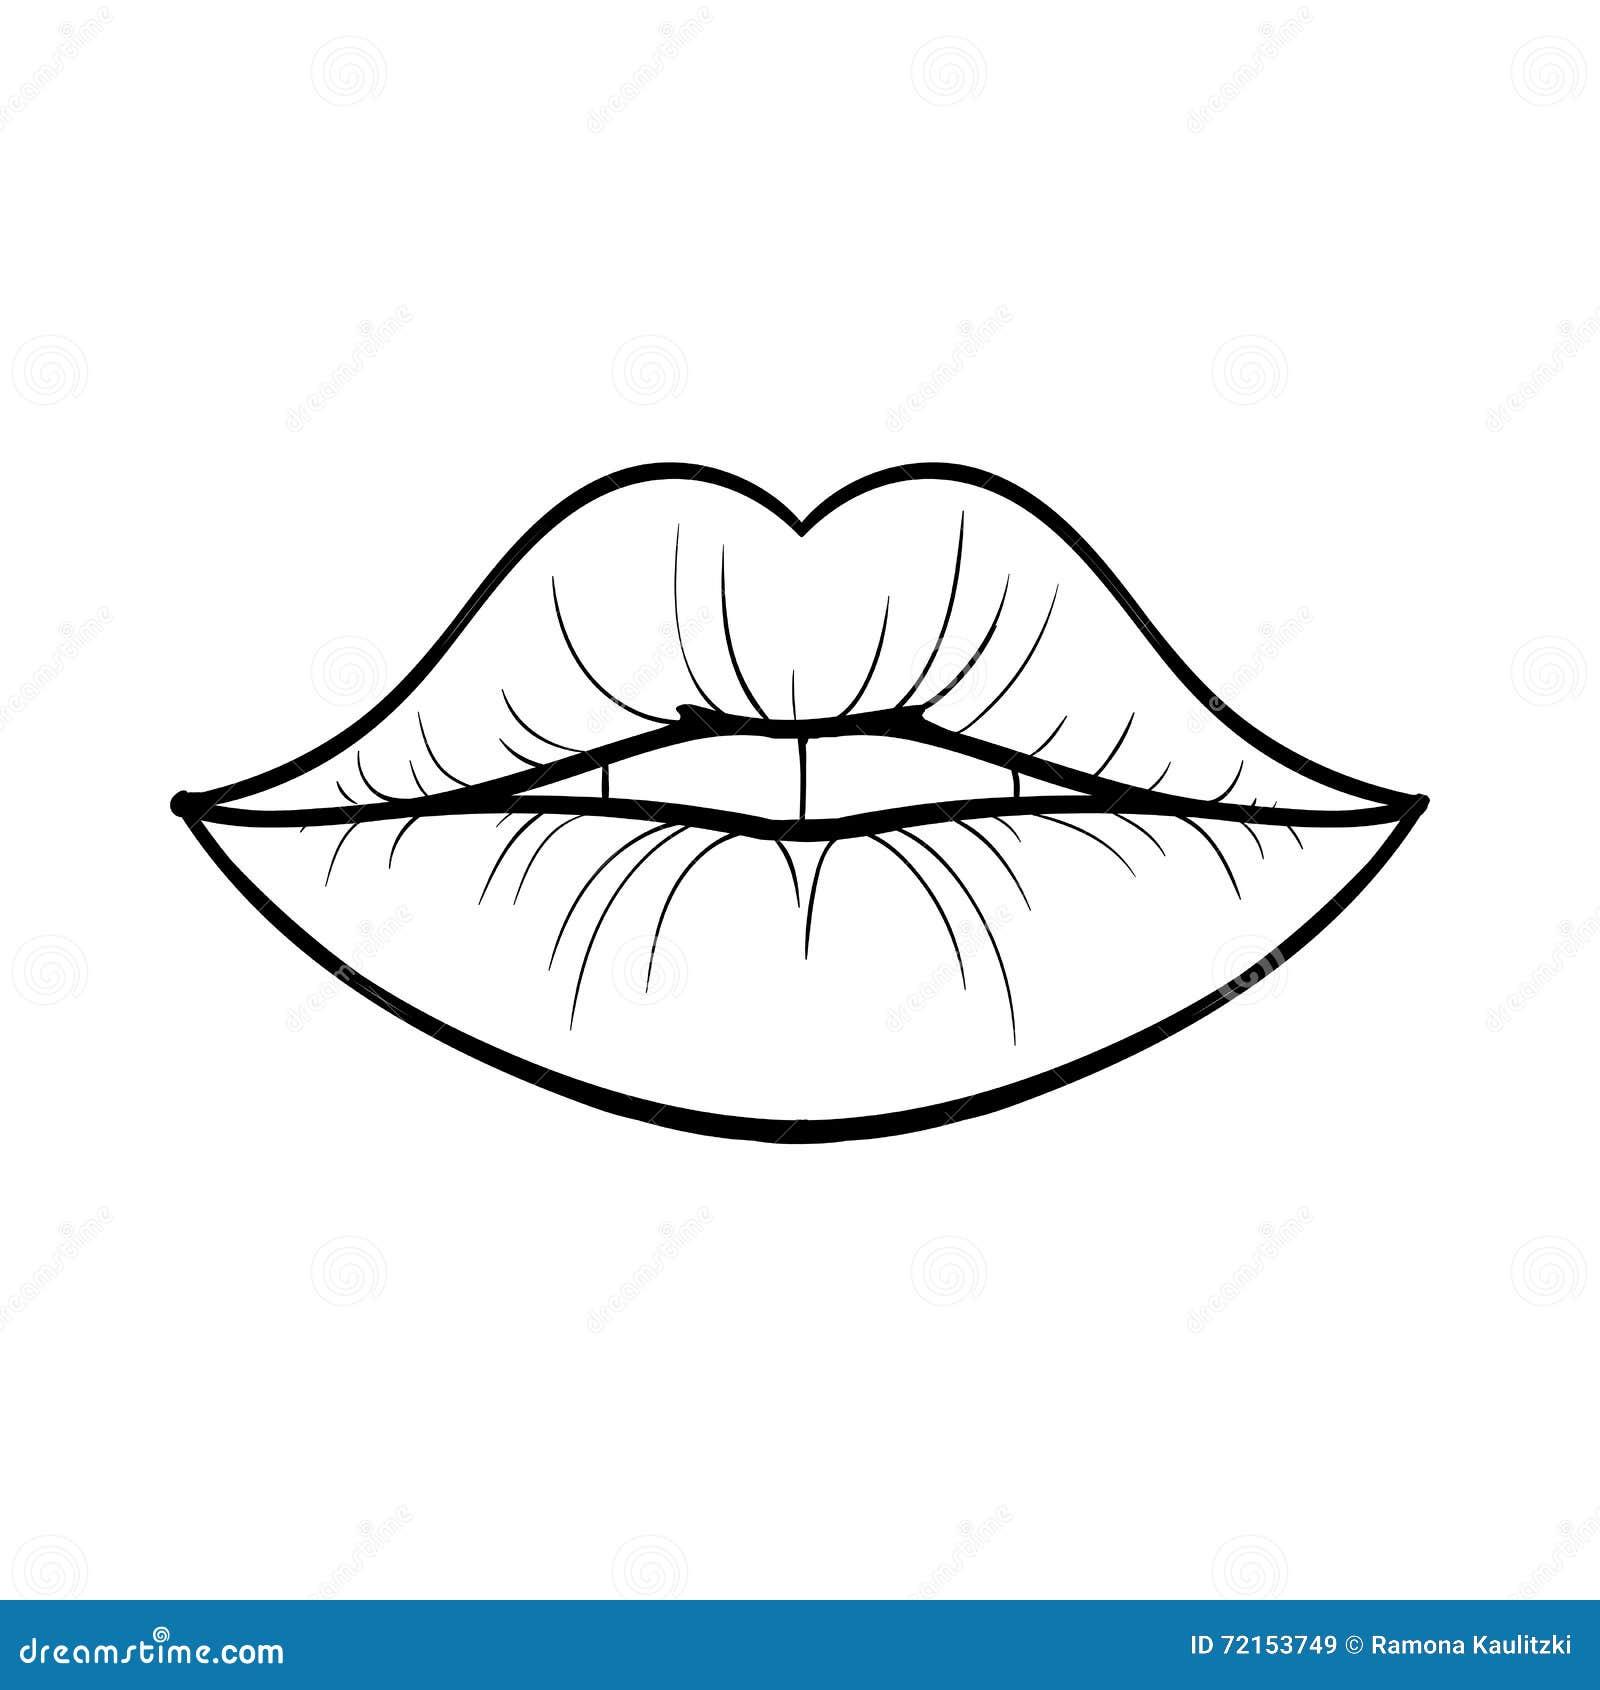 Line Art Lips : Wwoman lips stock illustration of kiss